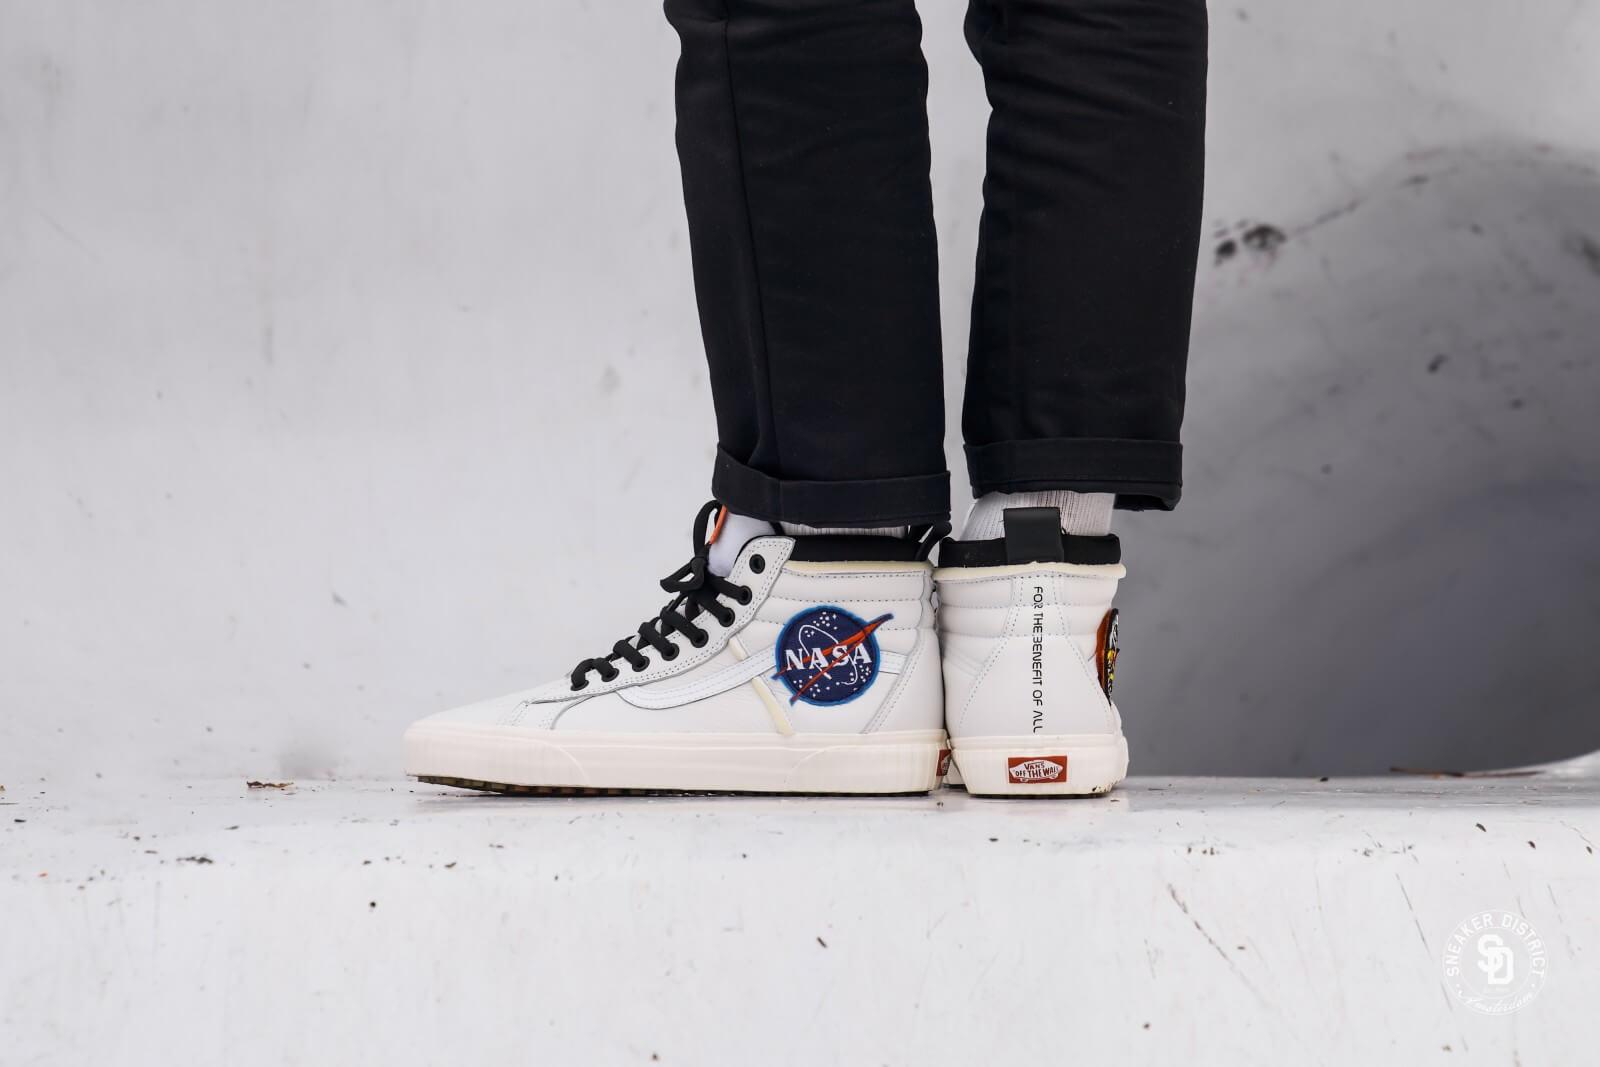 Vans x NASA Sk8 Hi 48 MTE DX Space Voyager White VN0A3DQ5UQ41